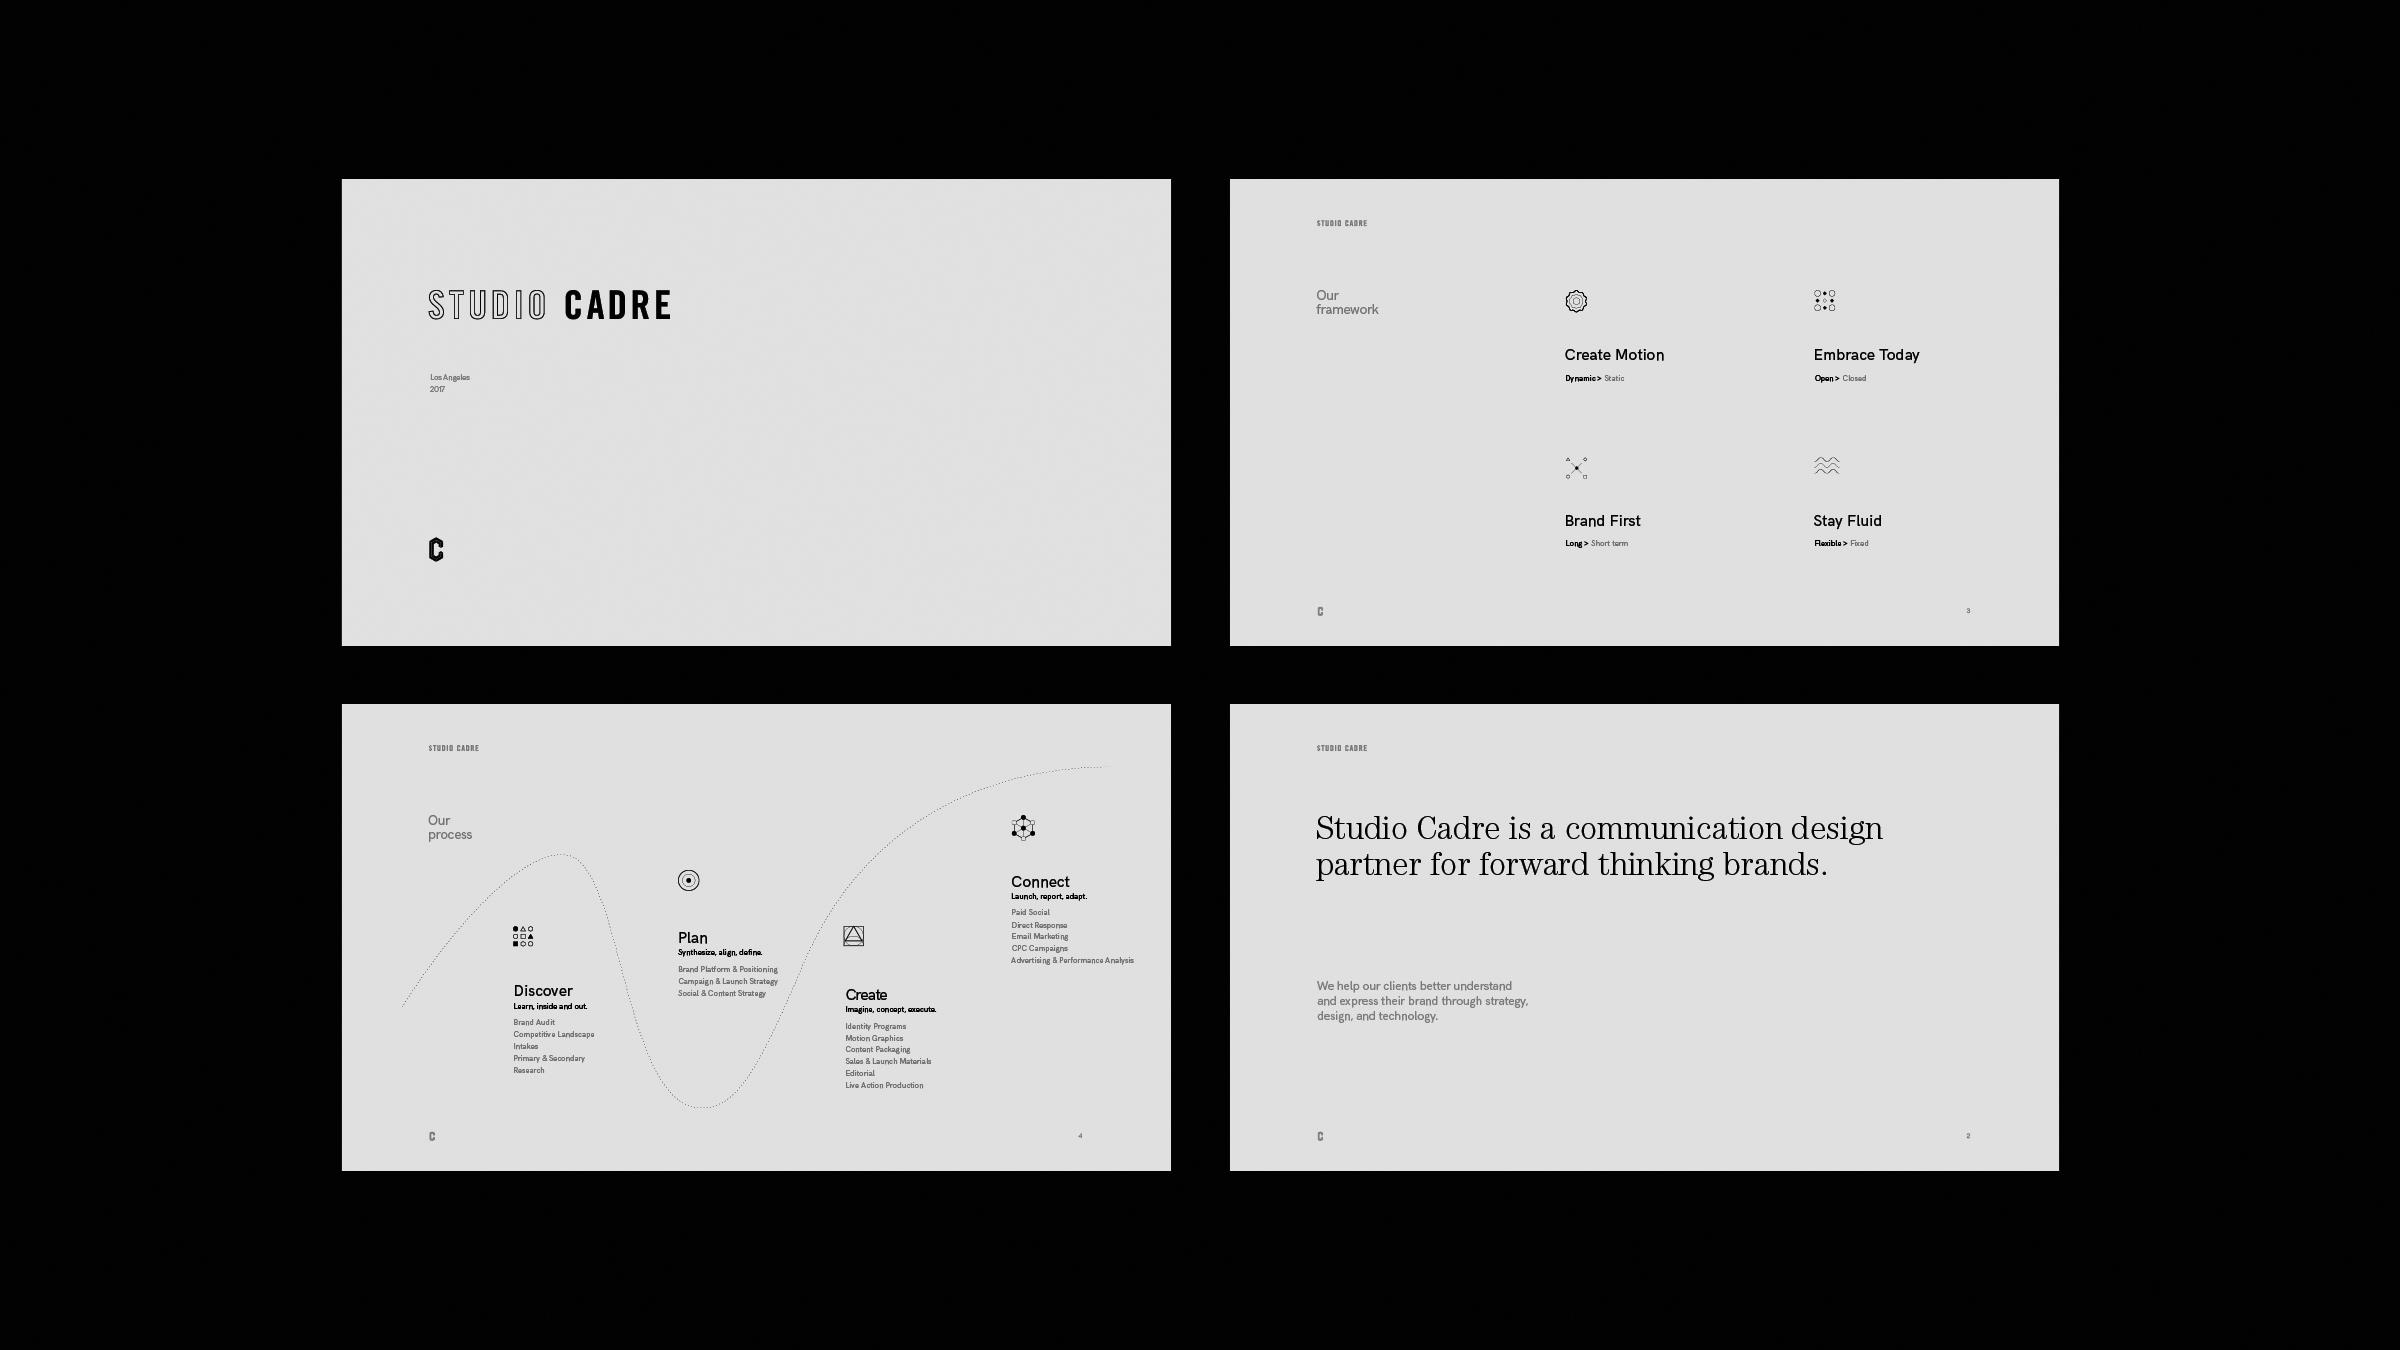 cadre-pres-sample.jpg